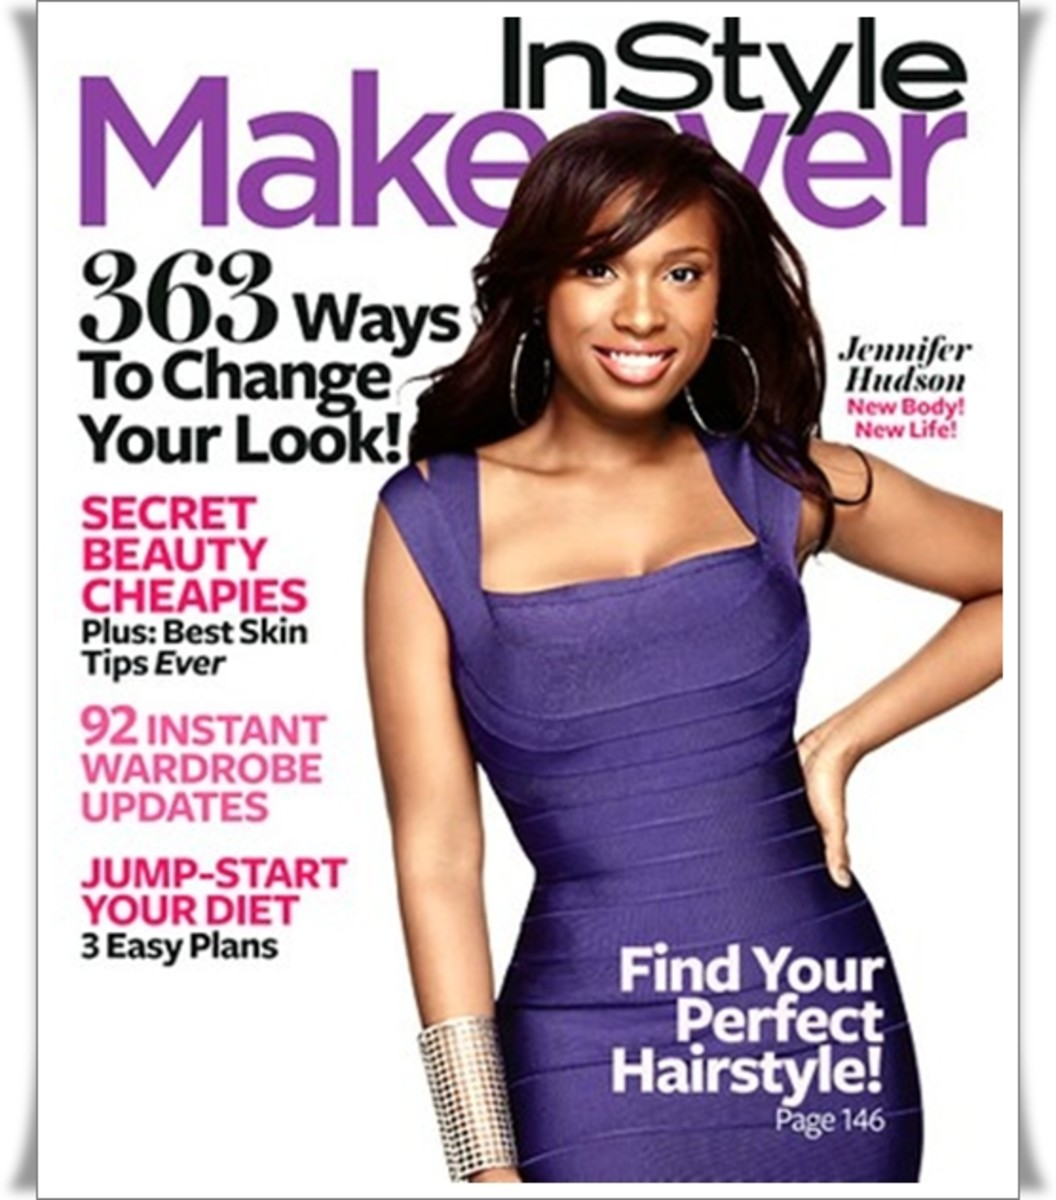 Jennifer Hudson gracing the cover of InStyle Makeover magazine. Photo:  Courtesy of InStyle magazine.